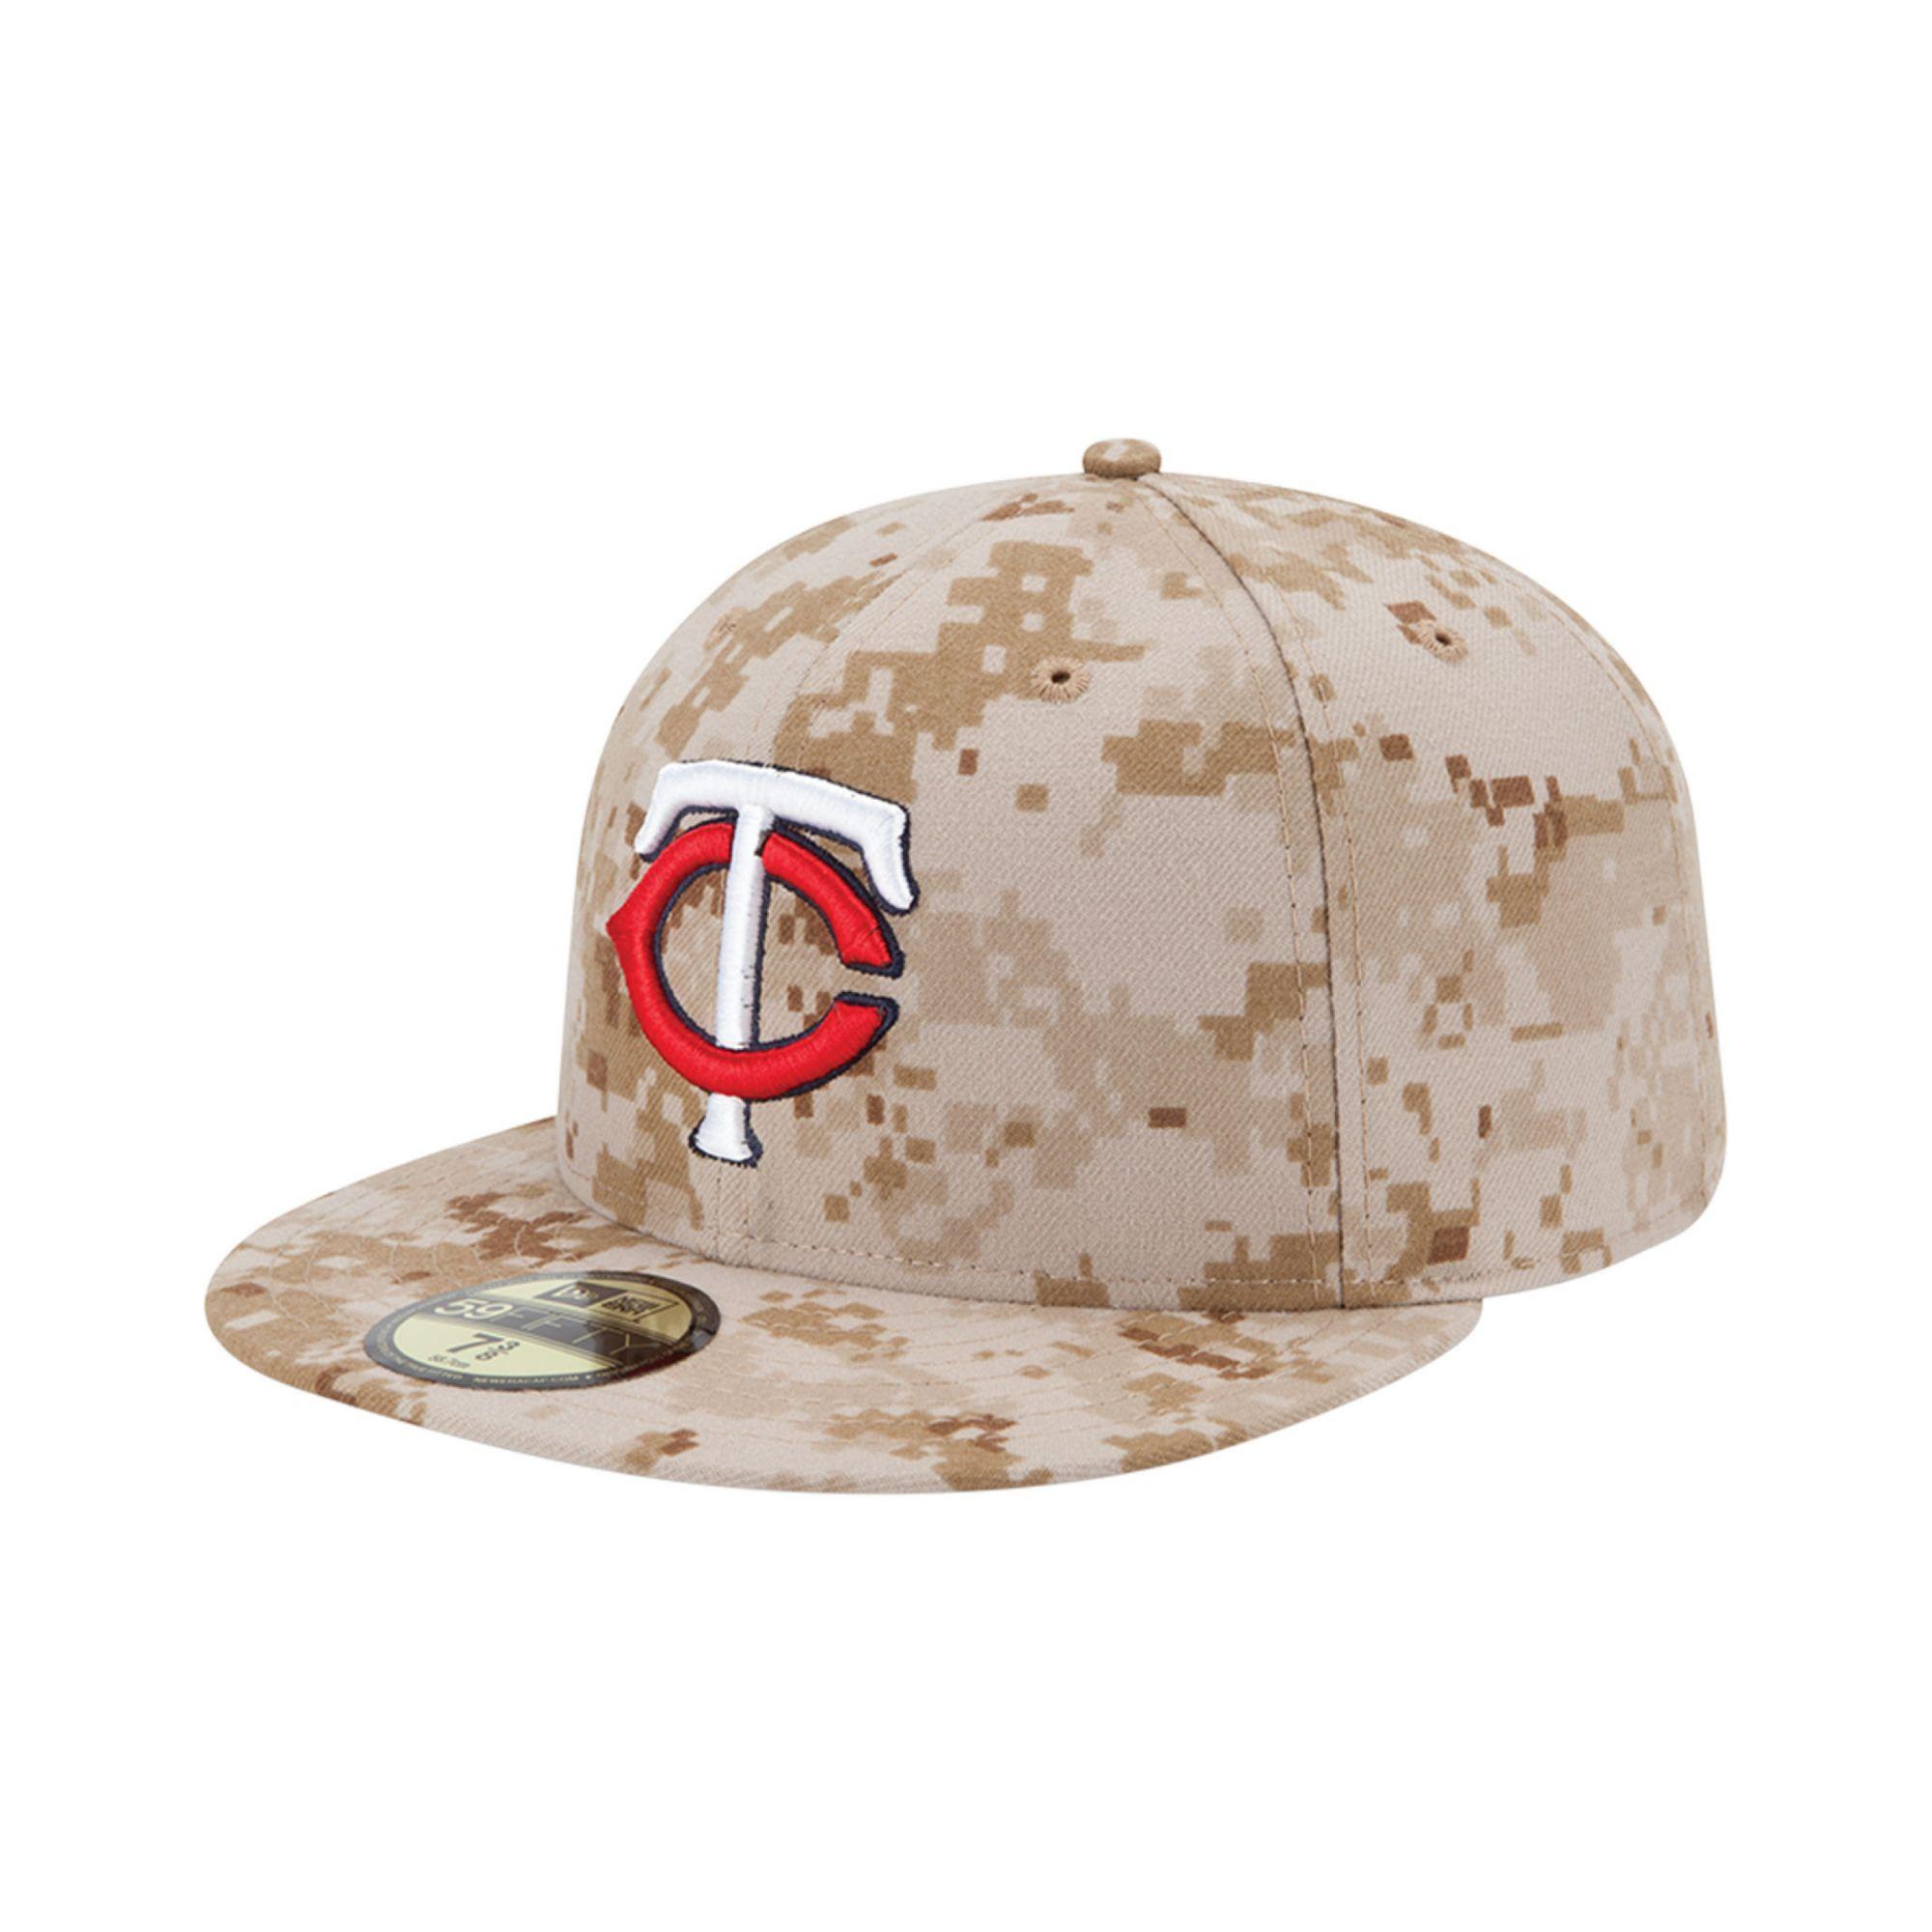 8317dc8ce00215 denmark los angeles dodgers 2014 usmc 59fifty fitted baseball cap new era  mlb 1 ada16 daaf5; cheapest lyst ktz minnesota twins mlb memorial day stars  ...